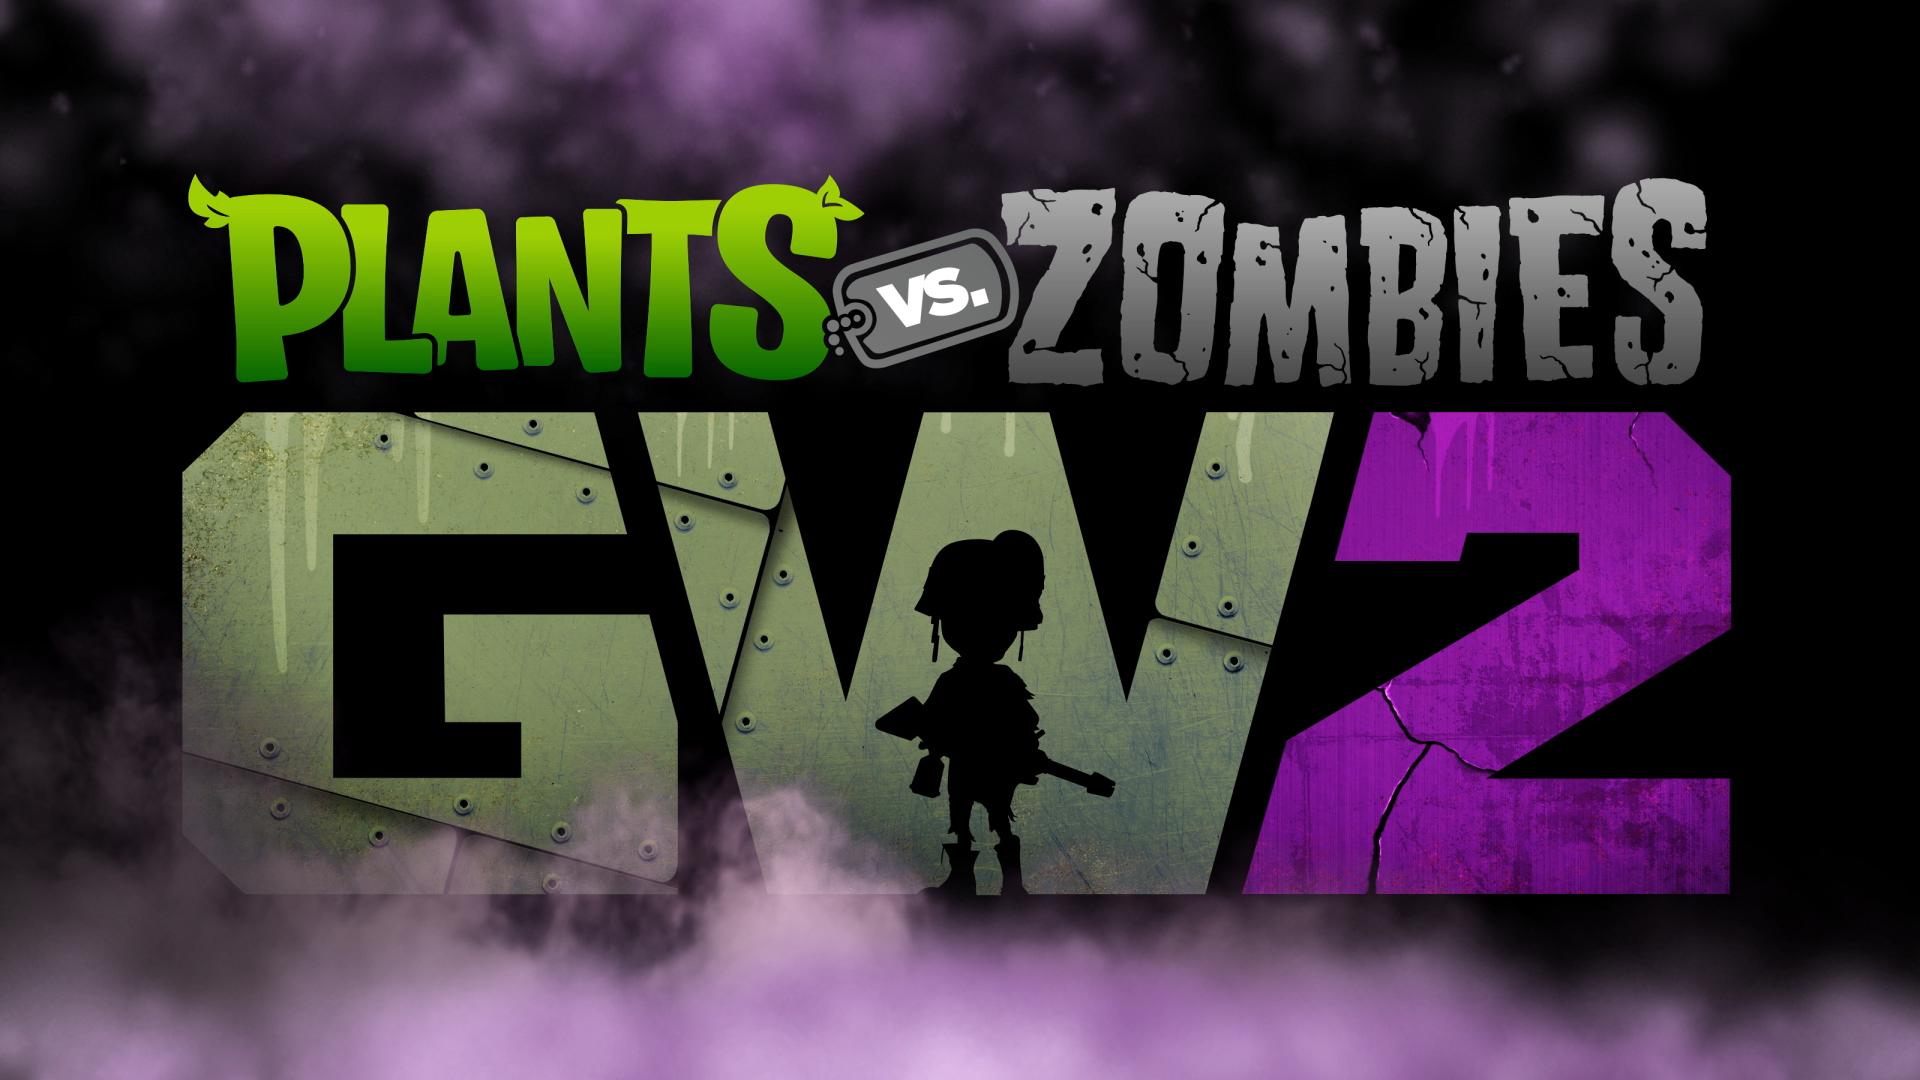 Plants vs zombies garden warfare pc торрент скачать